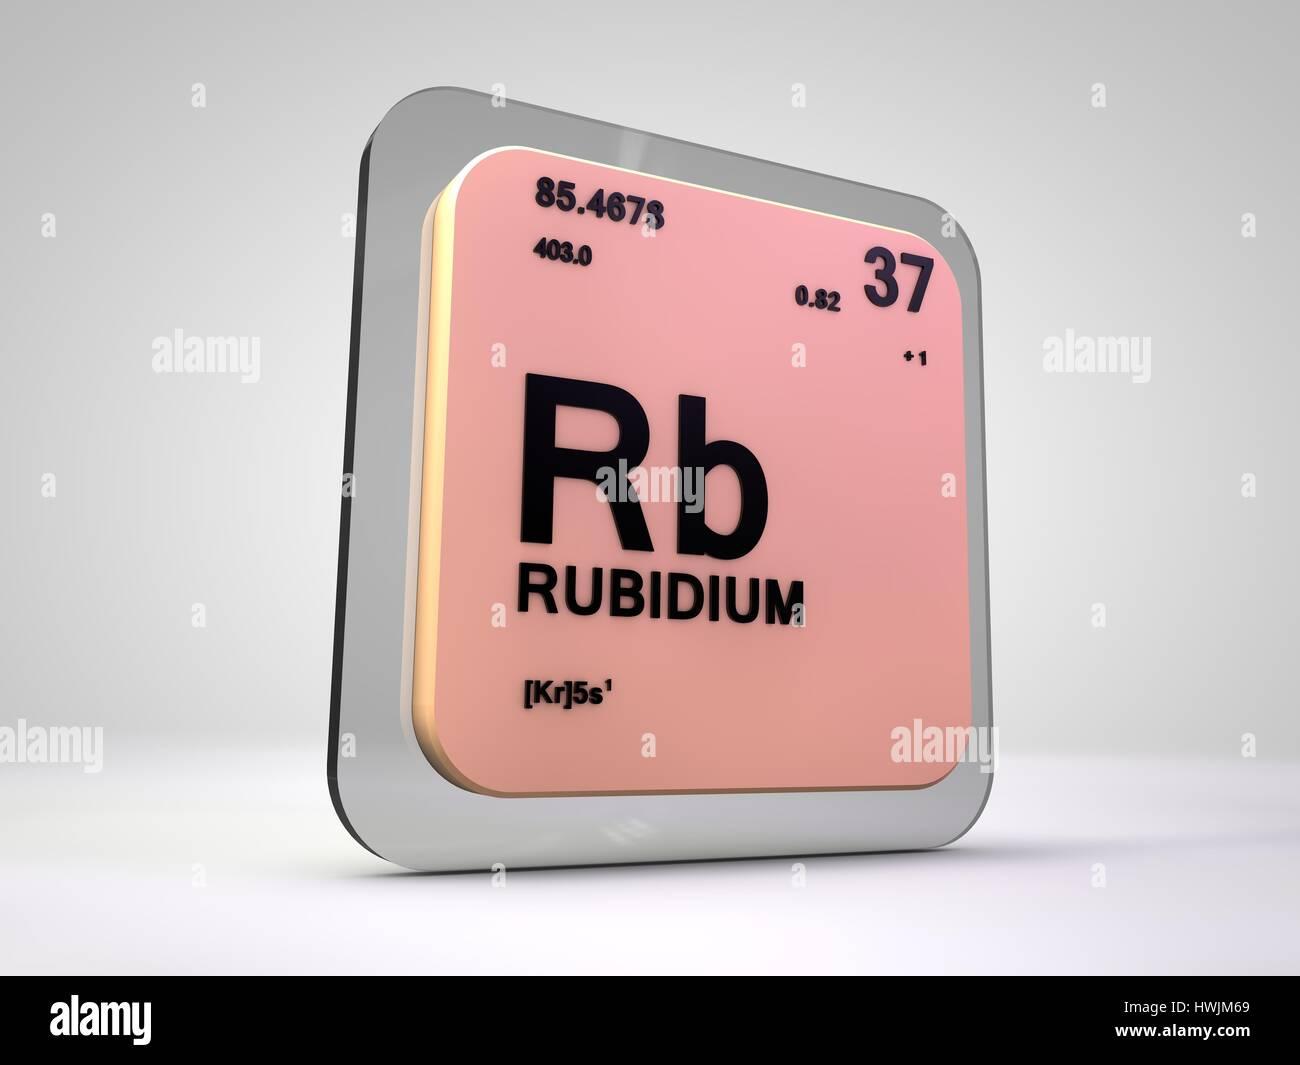 Rubidium rb chemical element periodic table 3d render stock rubidium rb chemical element periodic table 3d render buycottarizona Choice Image